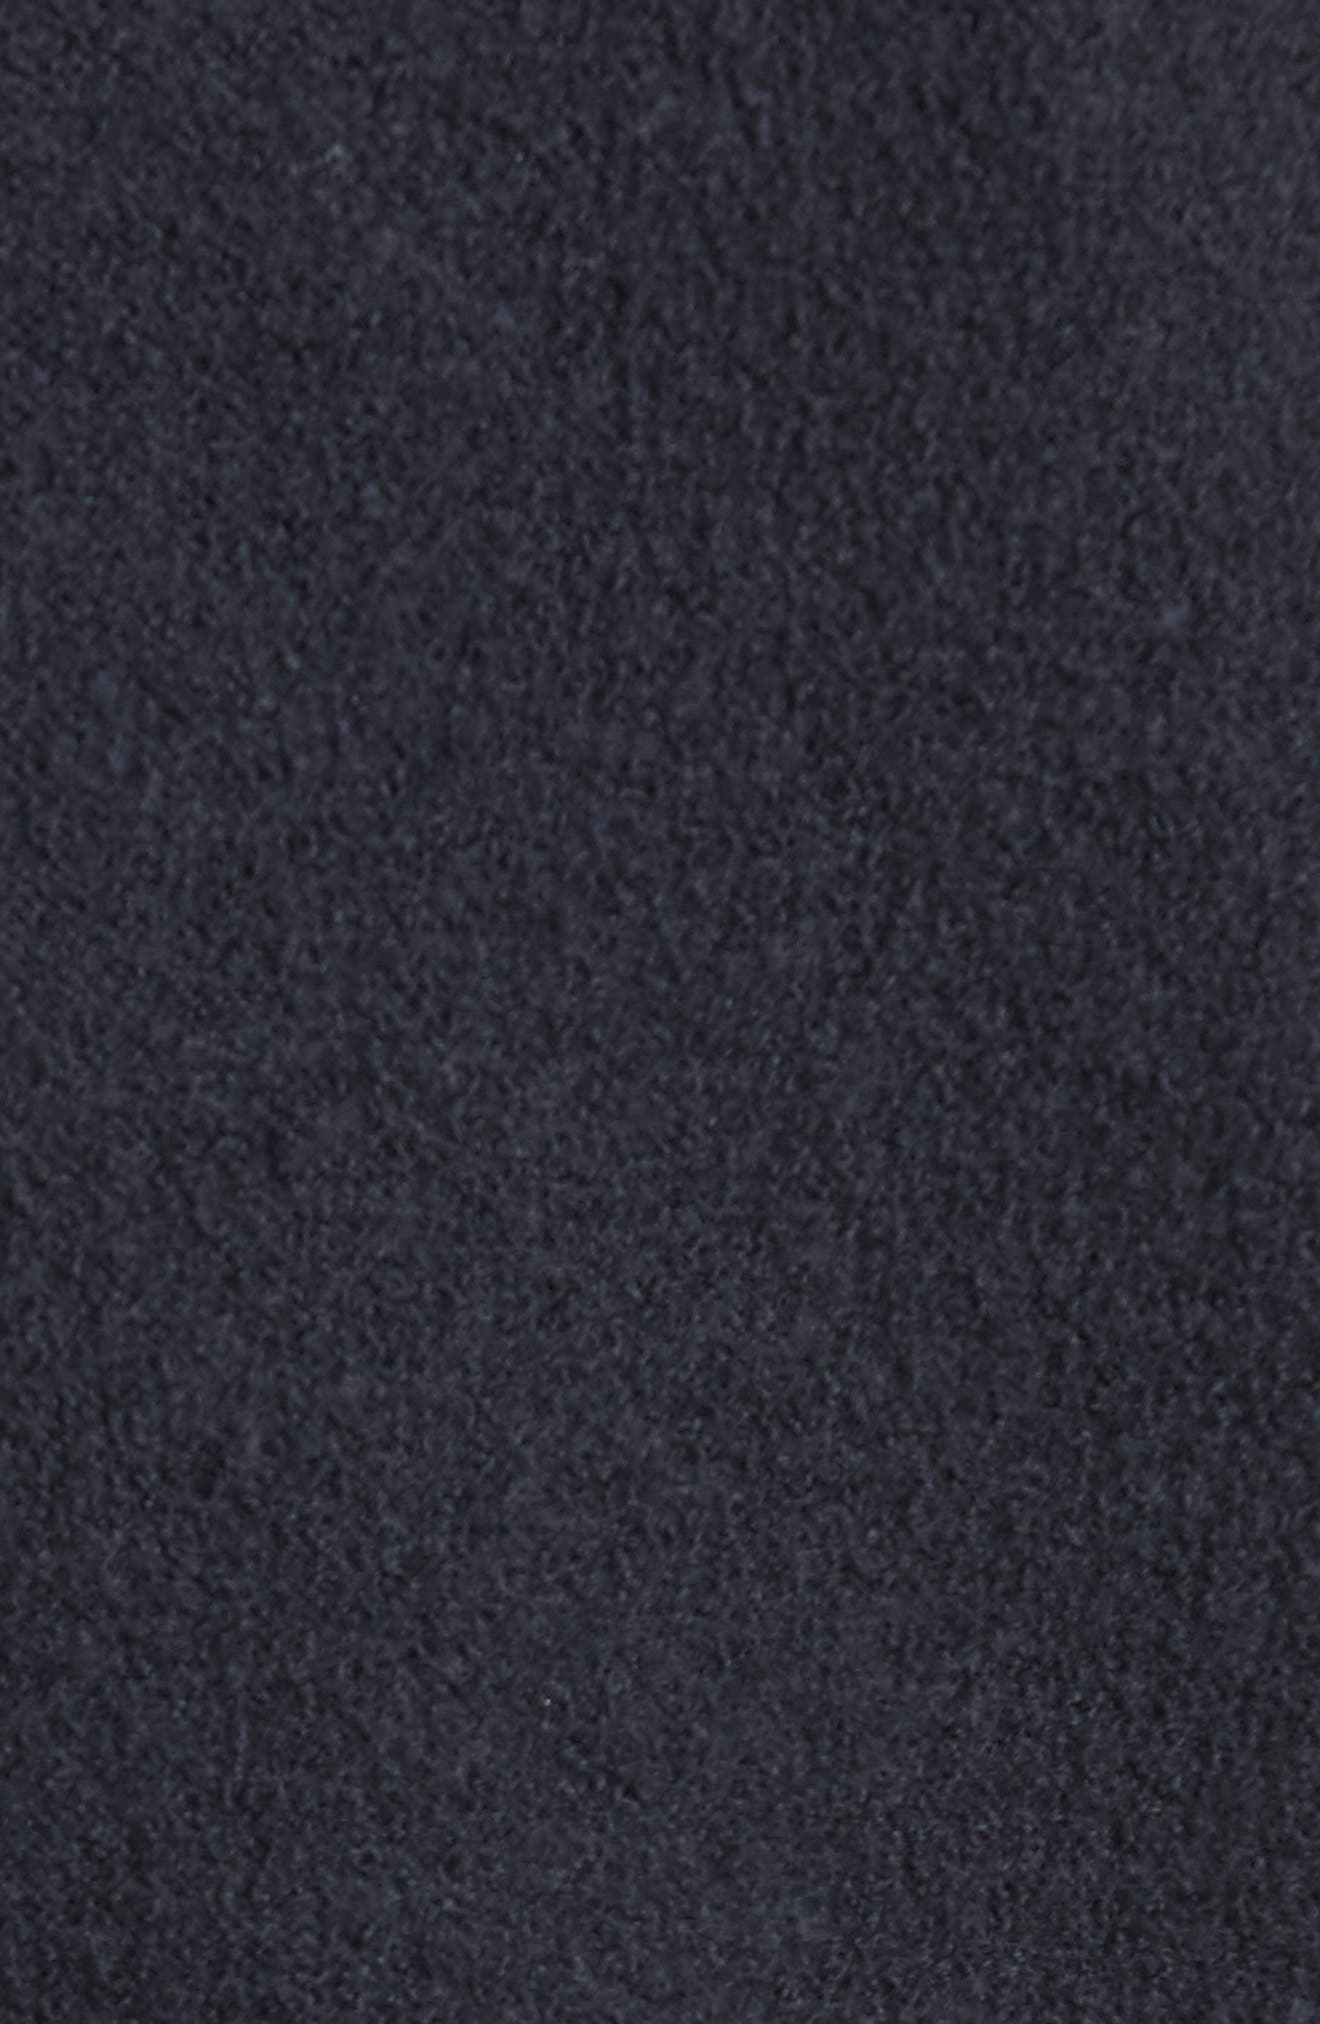 Armani Jeans Single Button Wool Coat,                             Alternate thumbnail 5, color,                             Navy